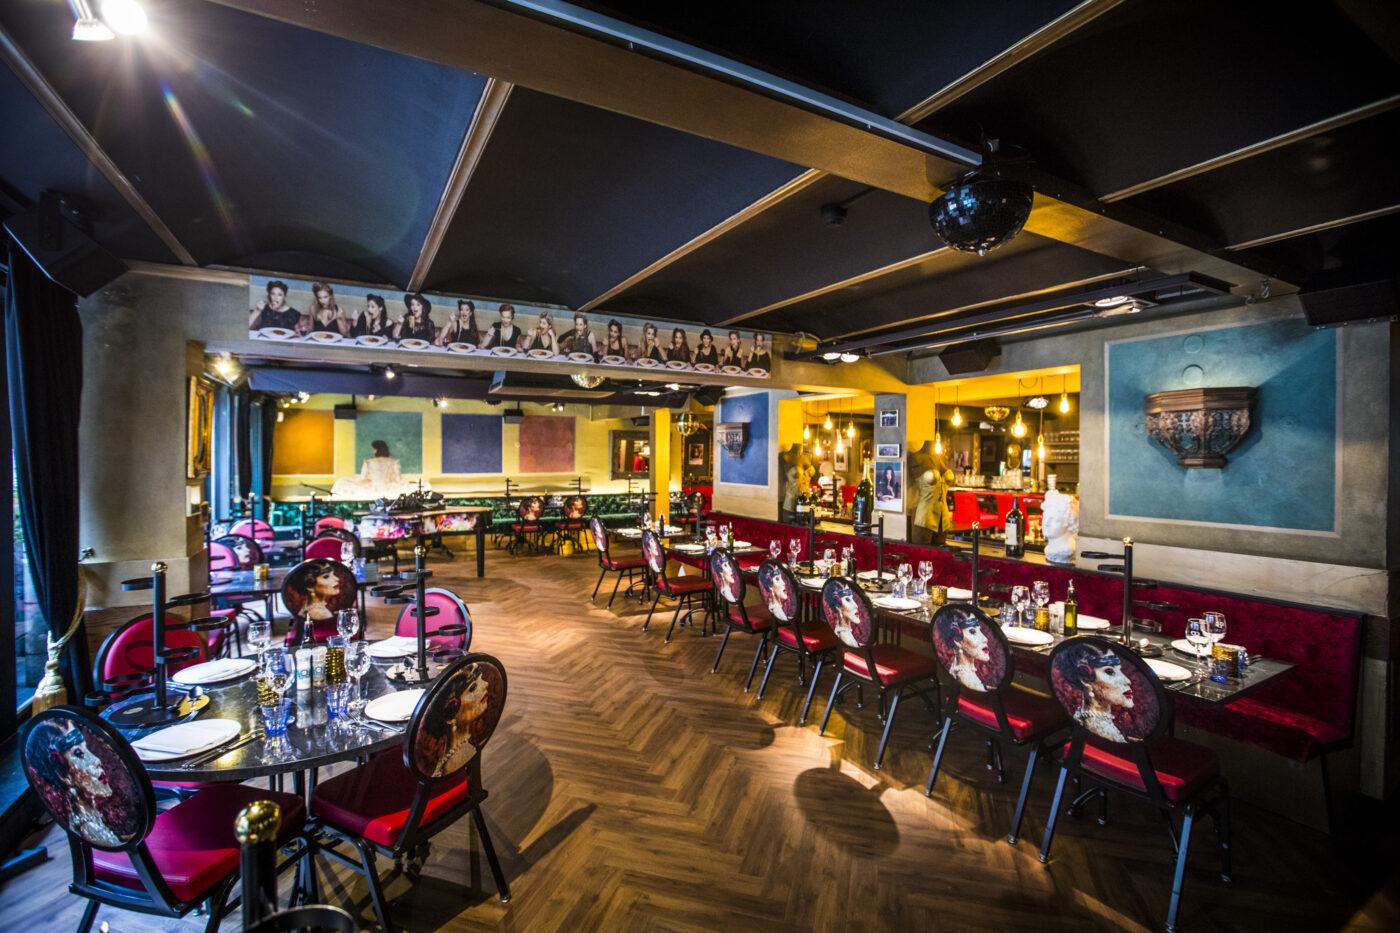 Restaurant met donkere visgraat vloer in Amsterdam